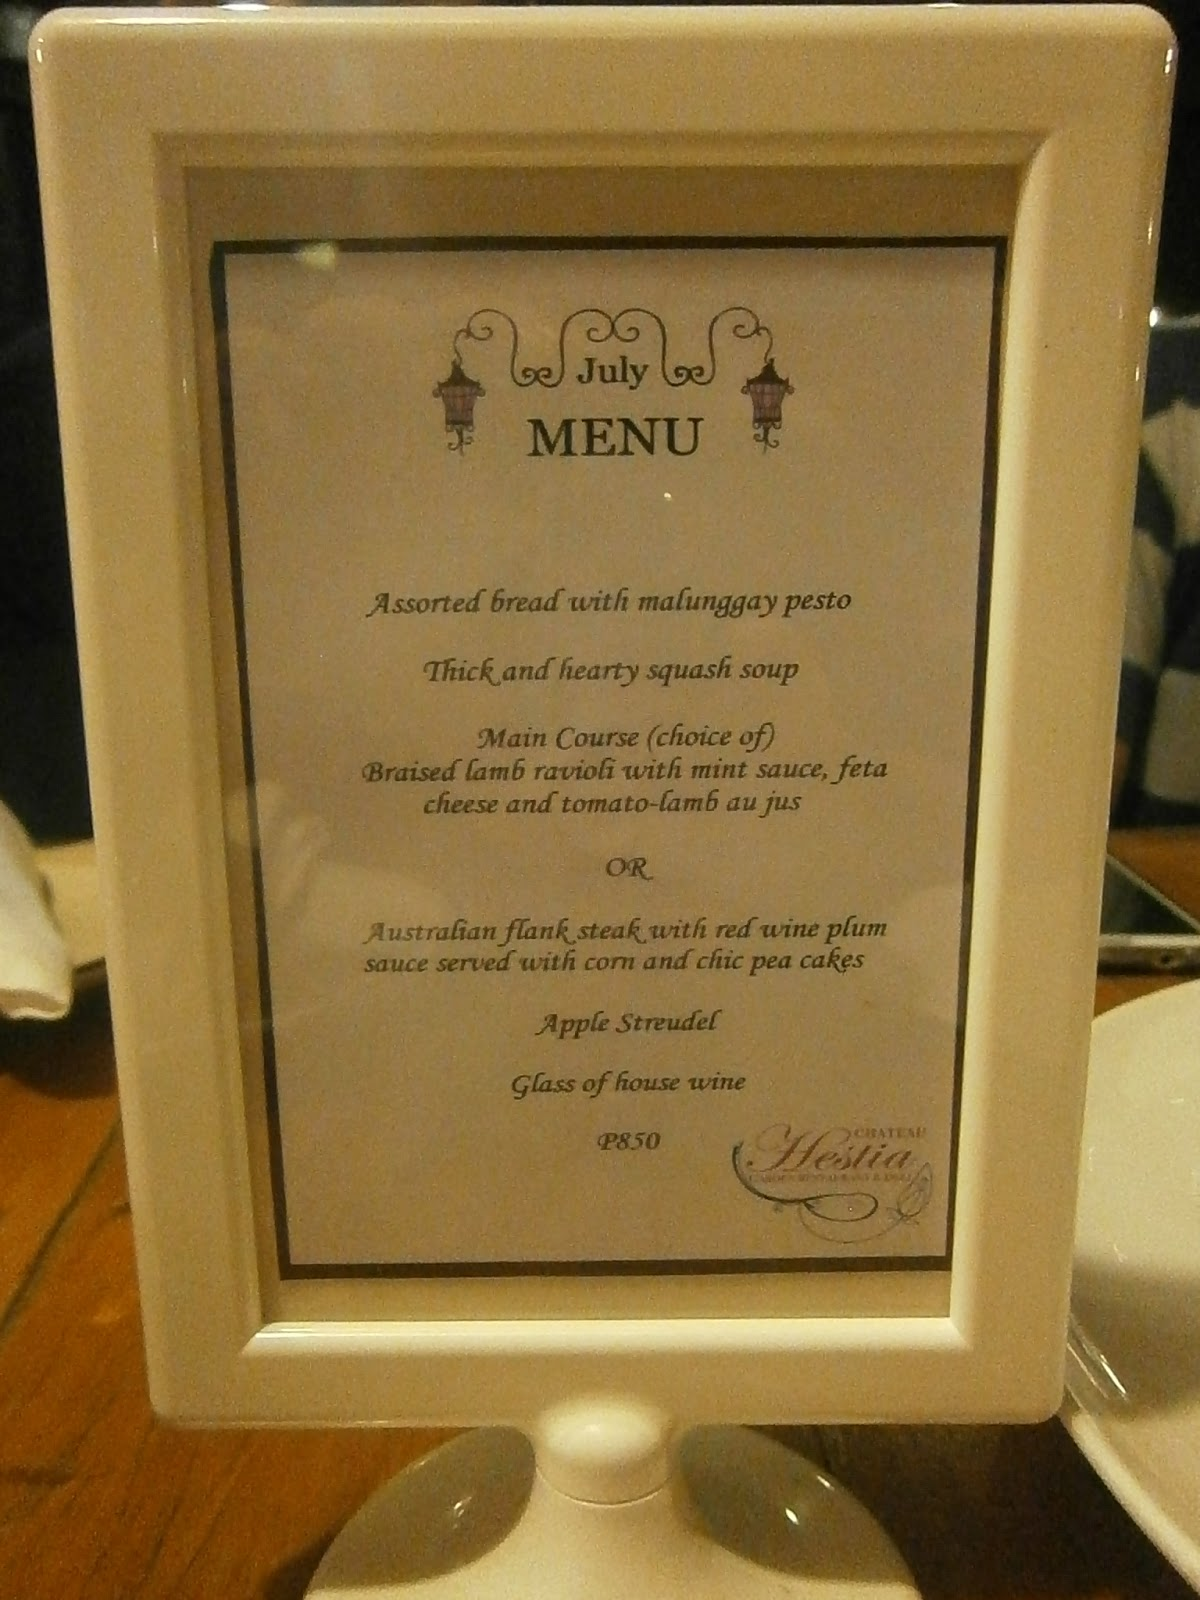 Photoescape Travels...: Food options at Chateau Hestia: Dinner Menu